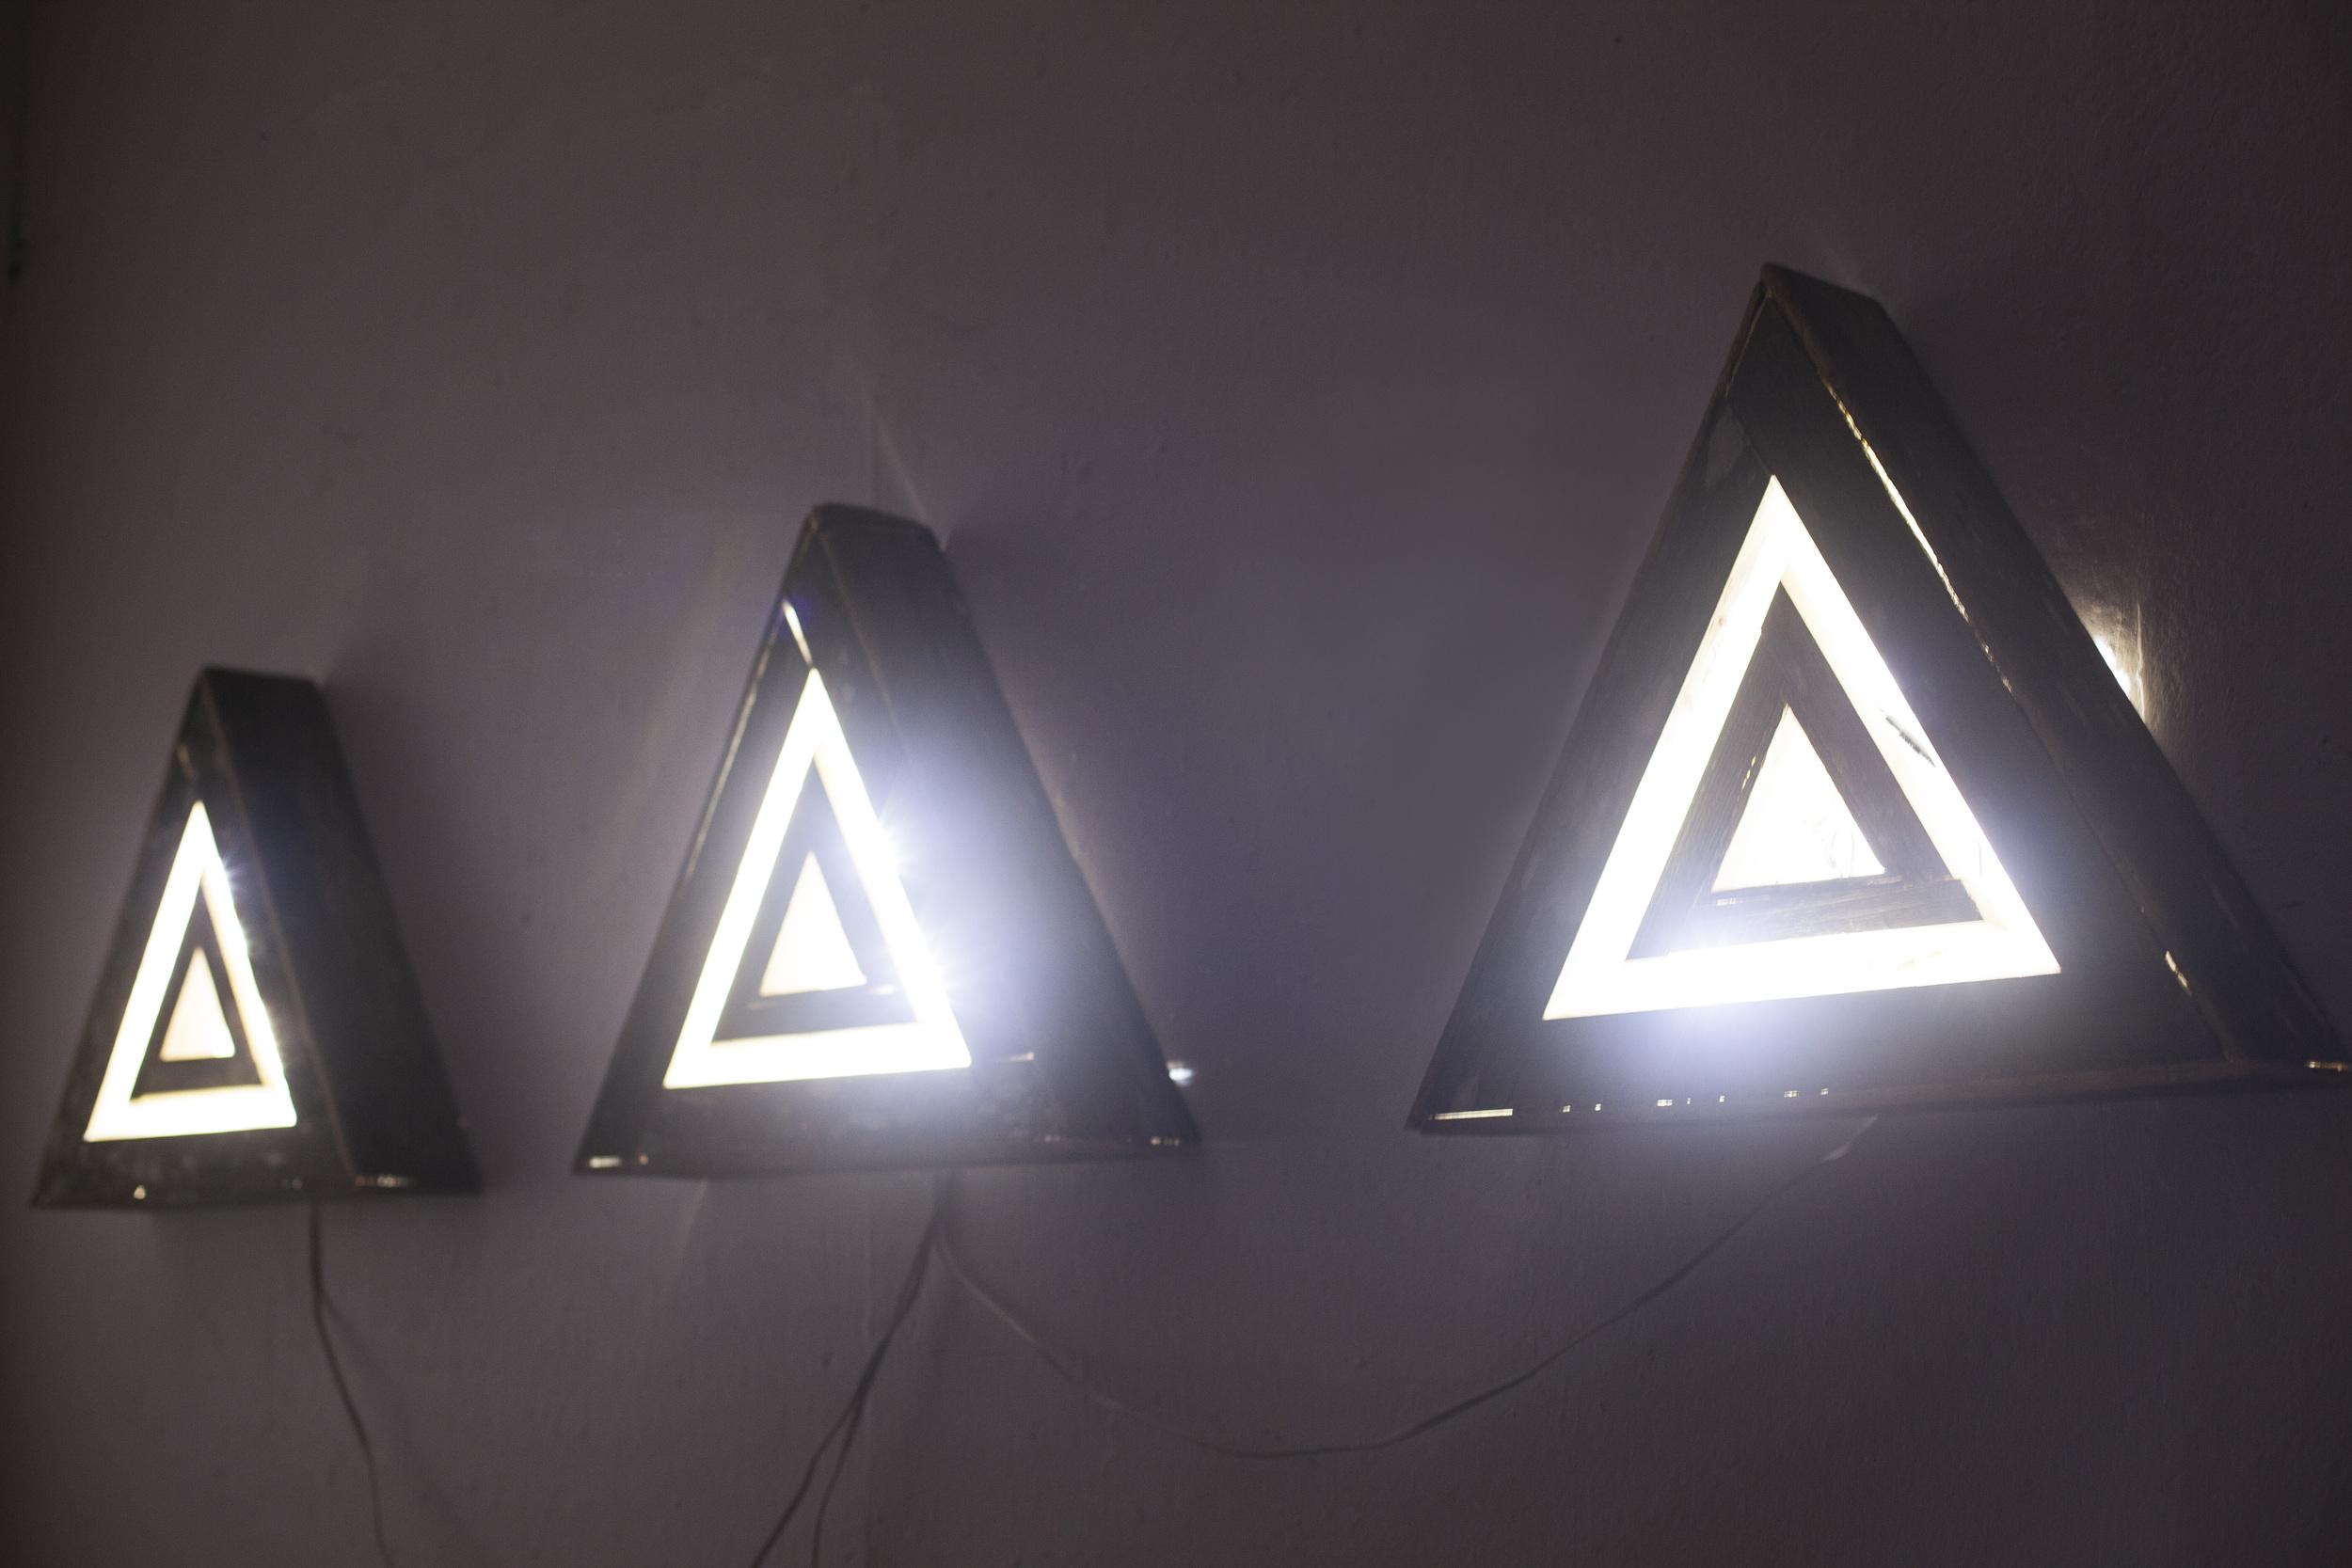 triangle2.jpg